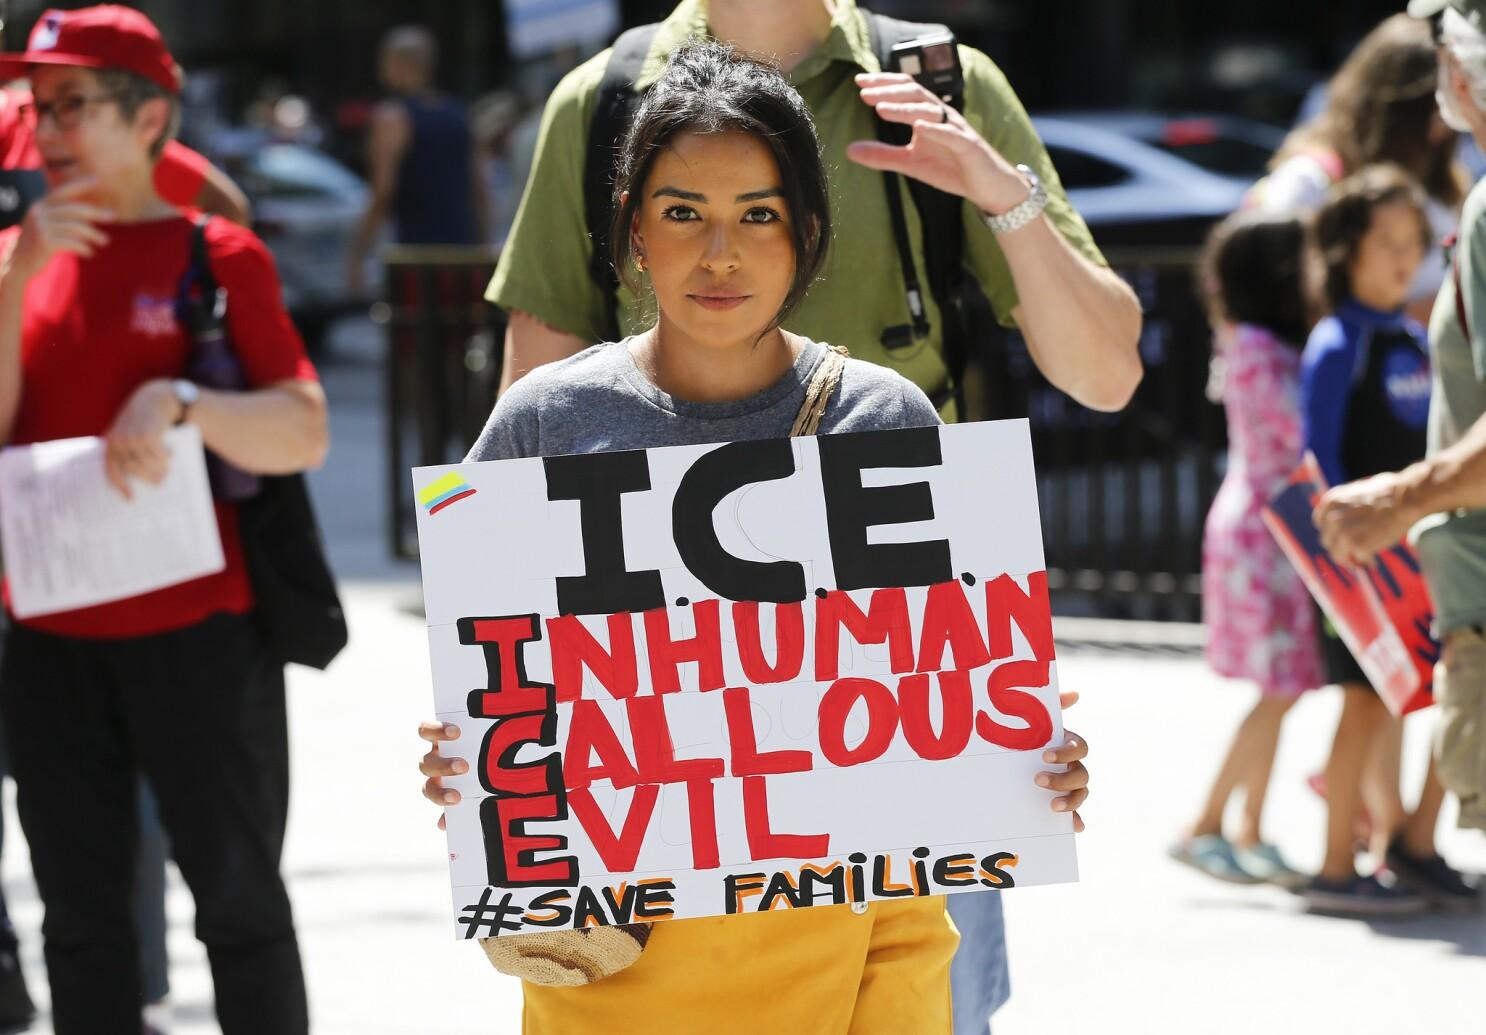 Despite weeks of threats, ICE raids begin with a whimper yet still